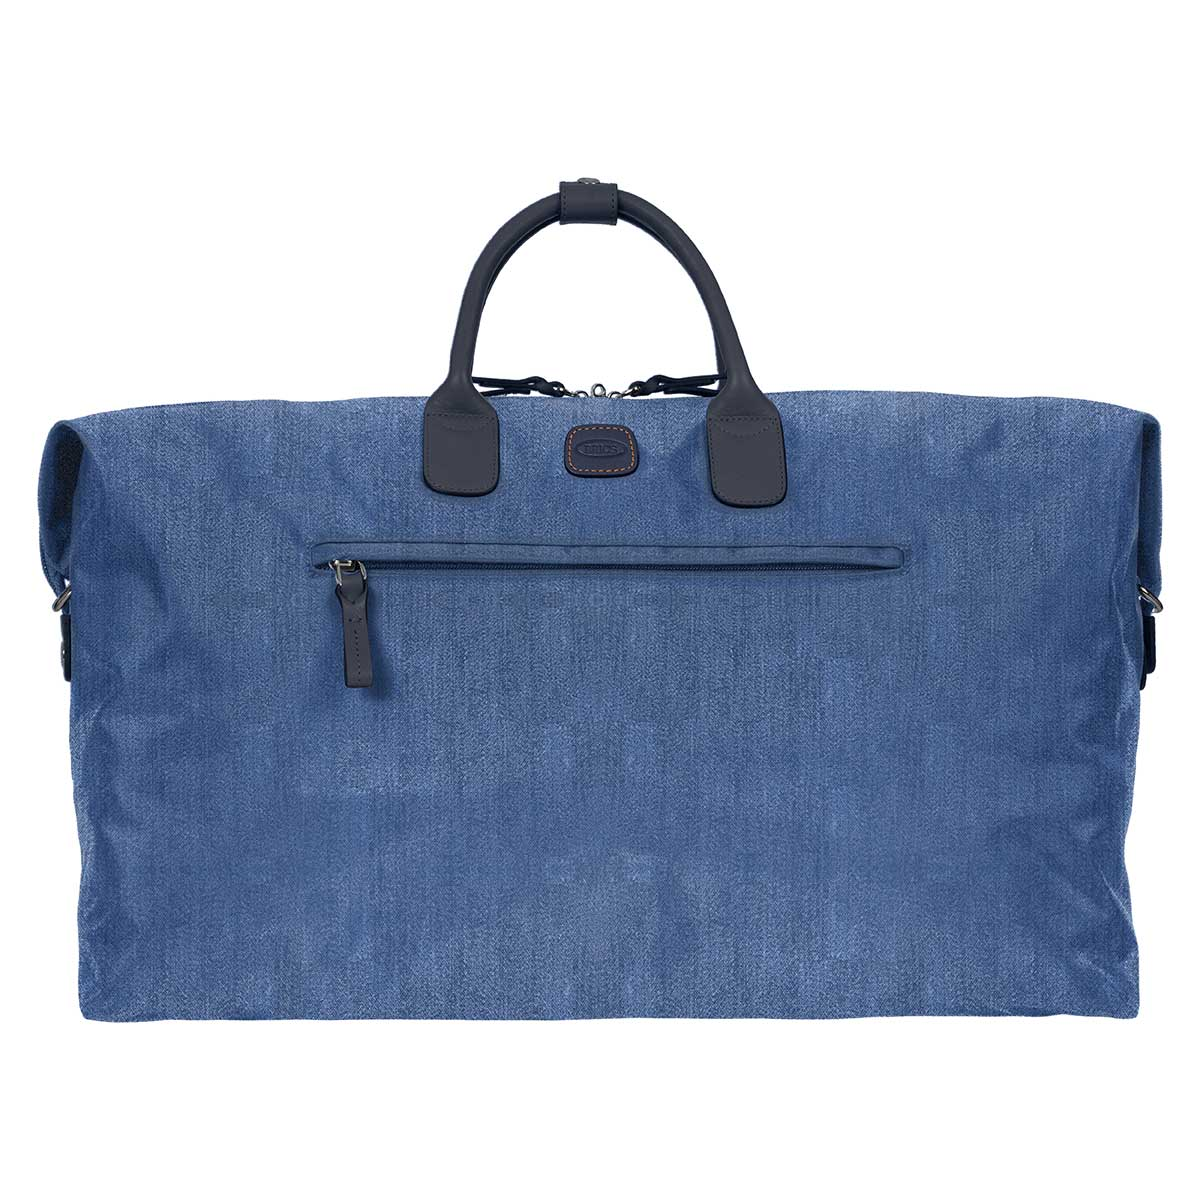 "X-Bag 22"" Deluxe Duffle Bag - papyrus   BRIC'S Travel Bag"